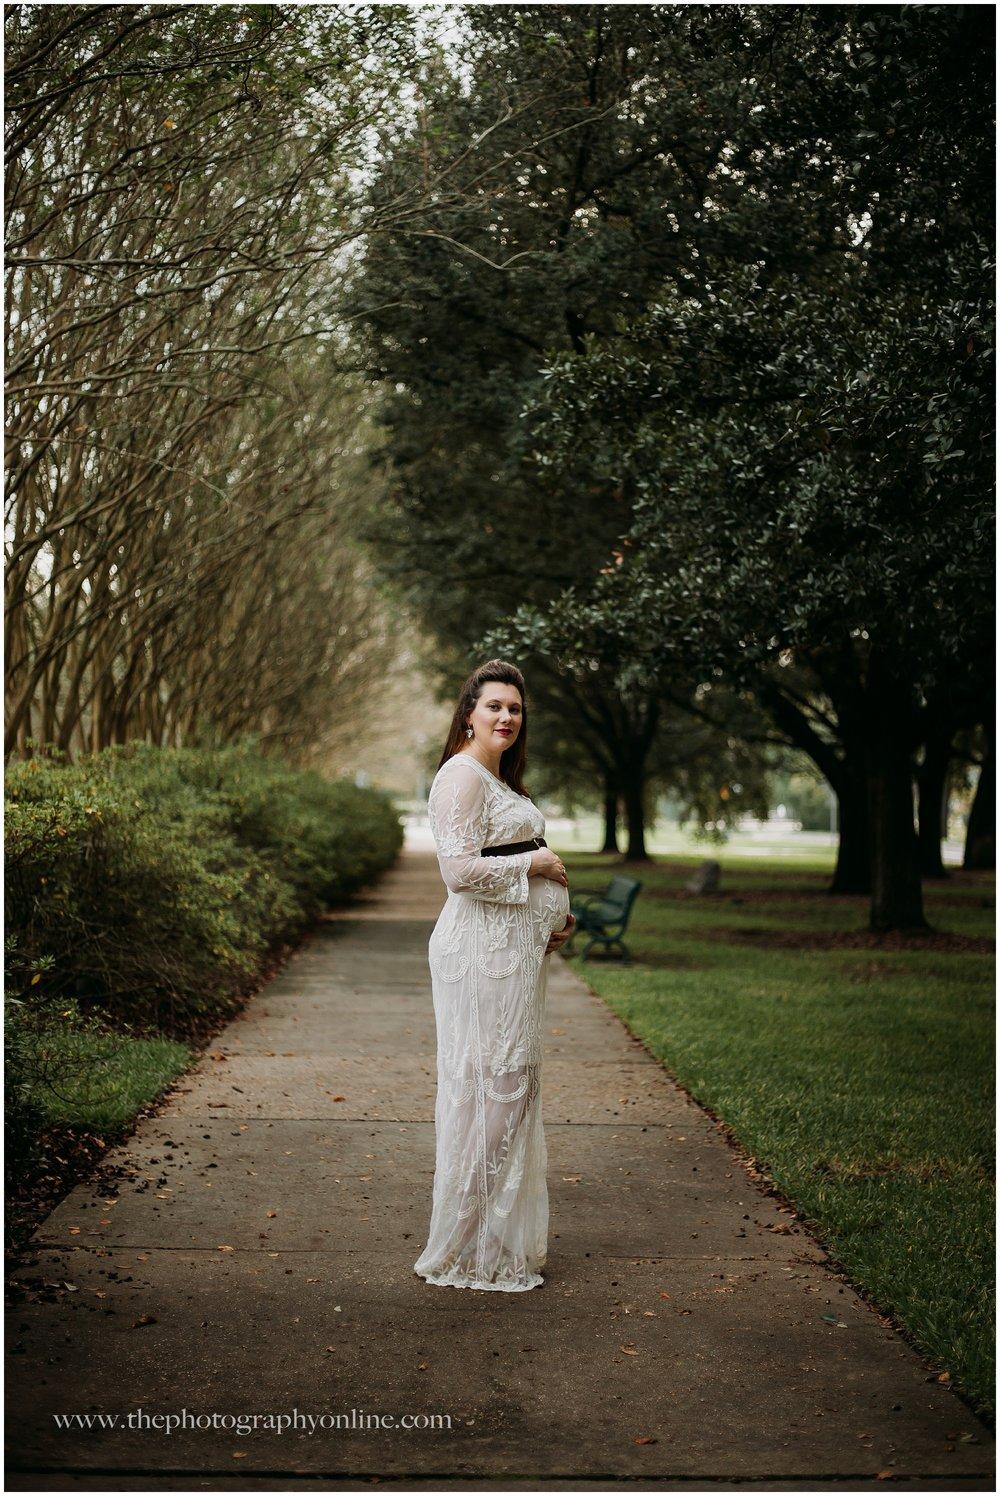 Houston-maternity-photographer-0778832.jpg